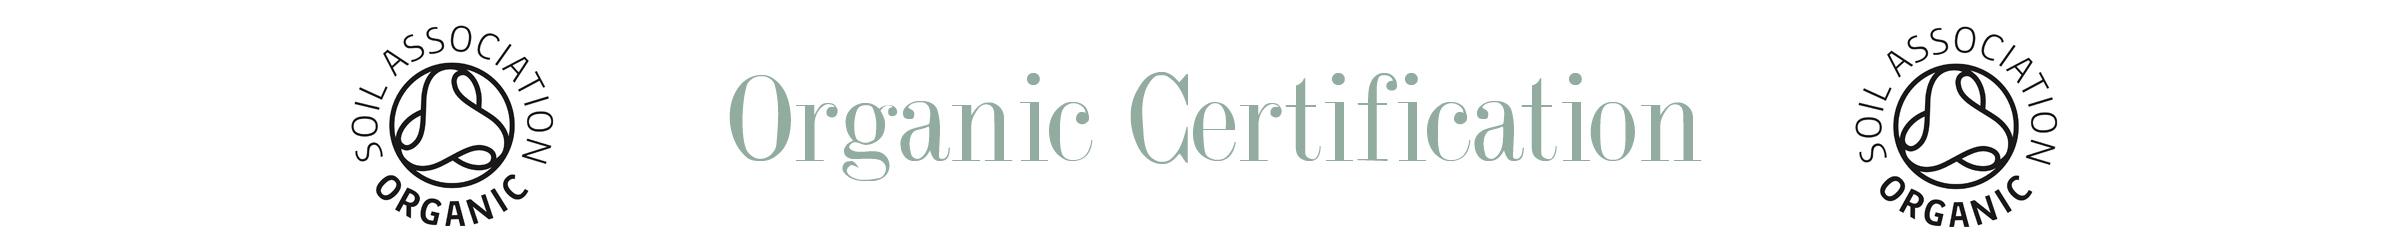 organic-certification.jpg